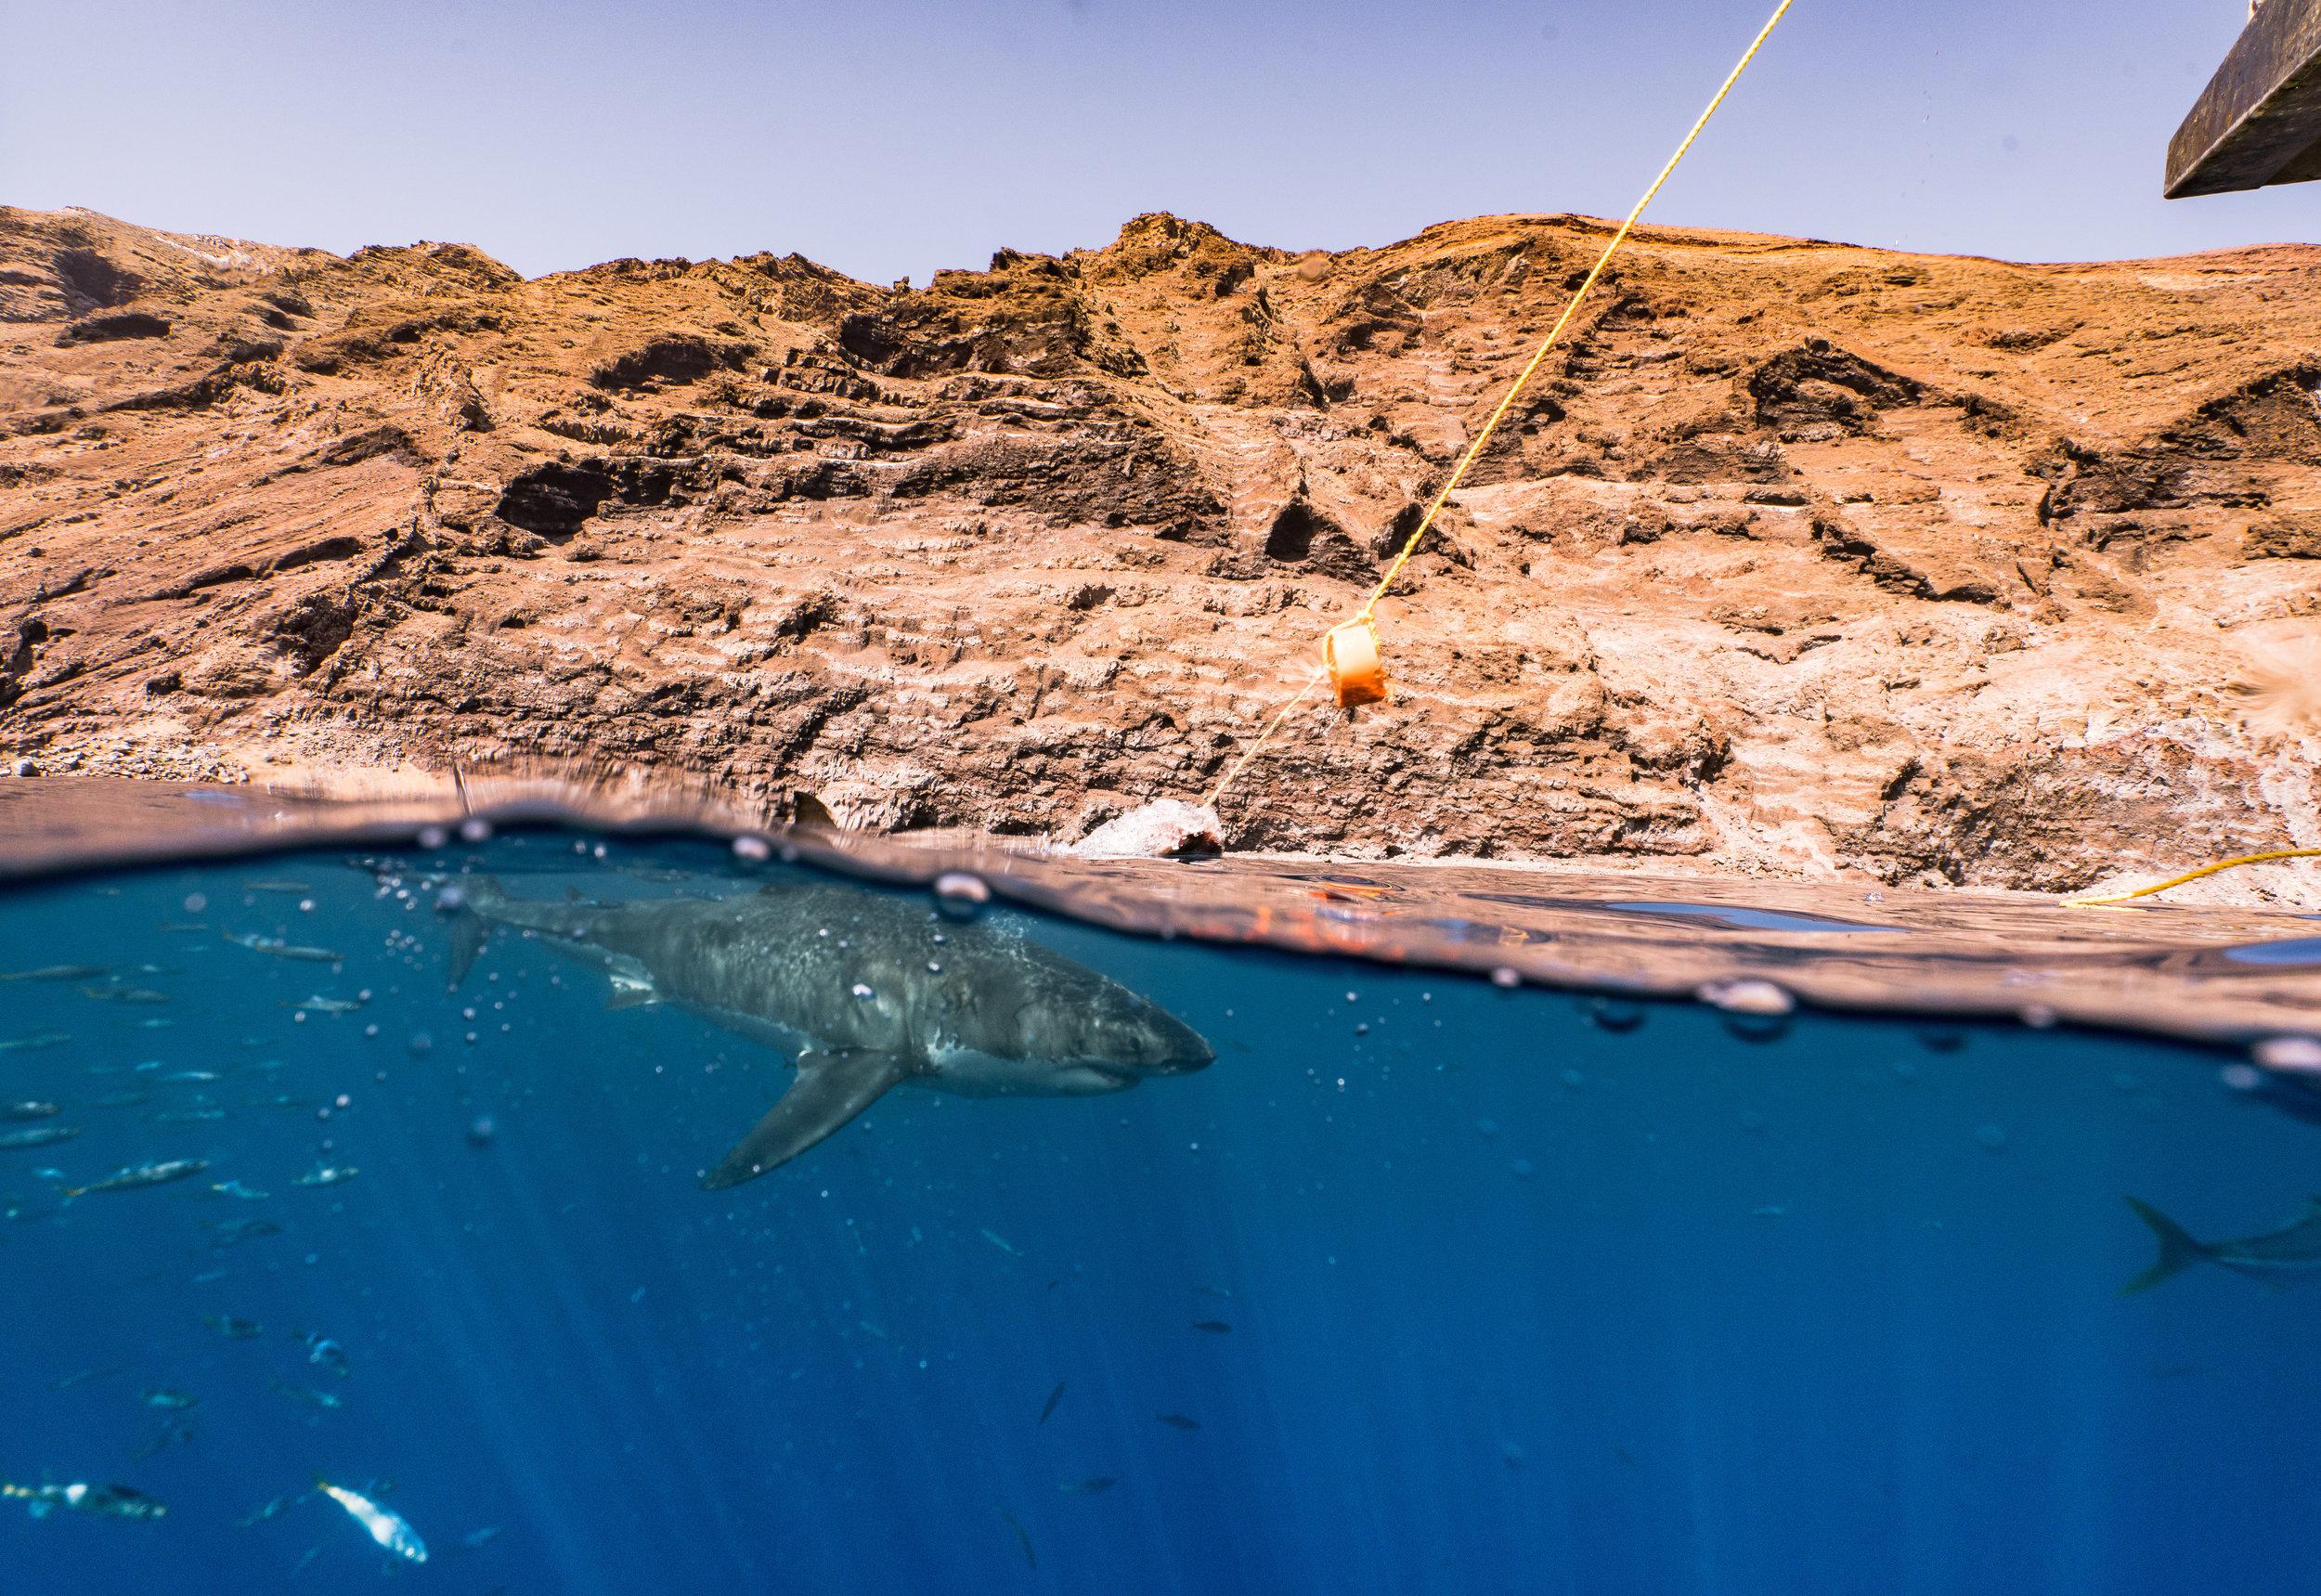 Shark Low Res--22.jpg